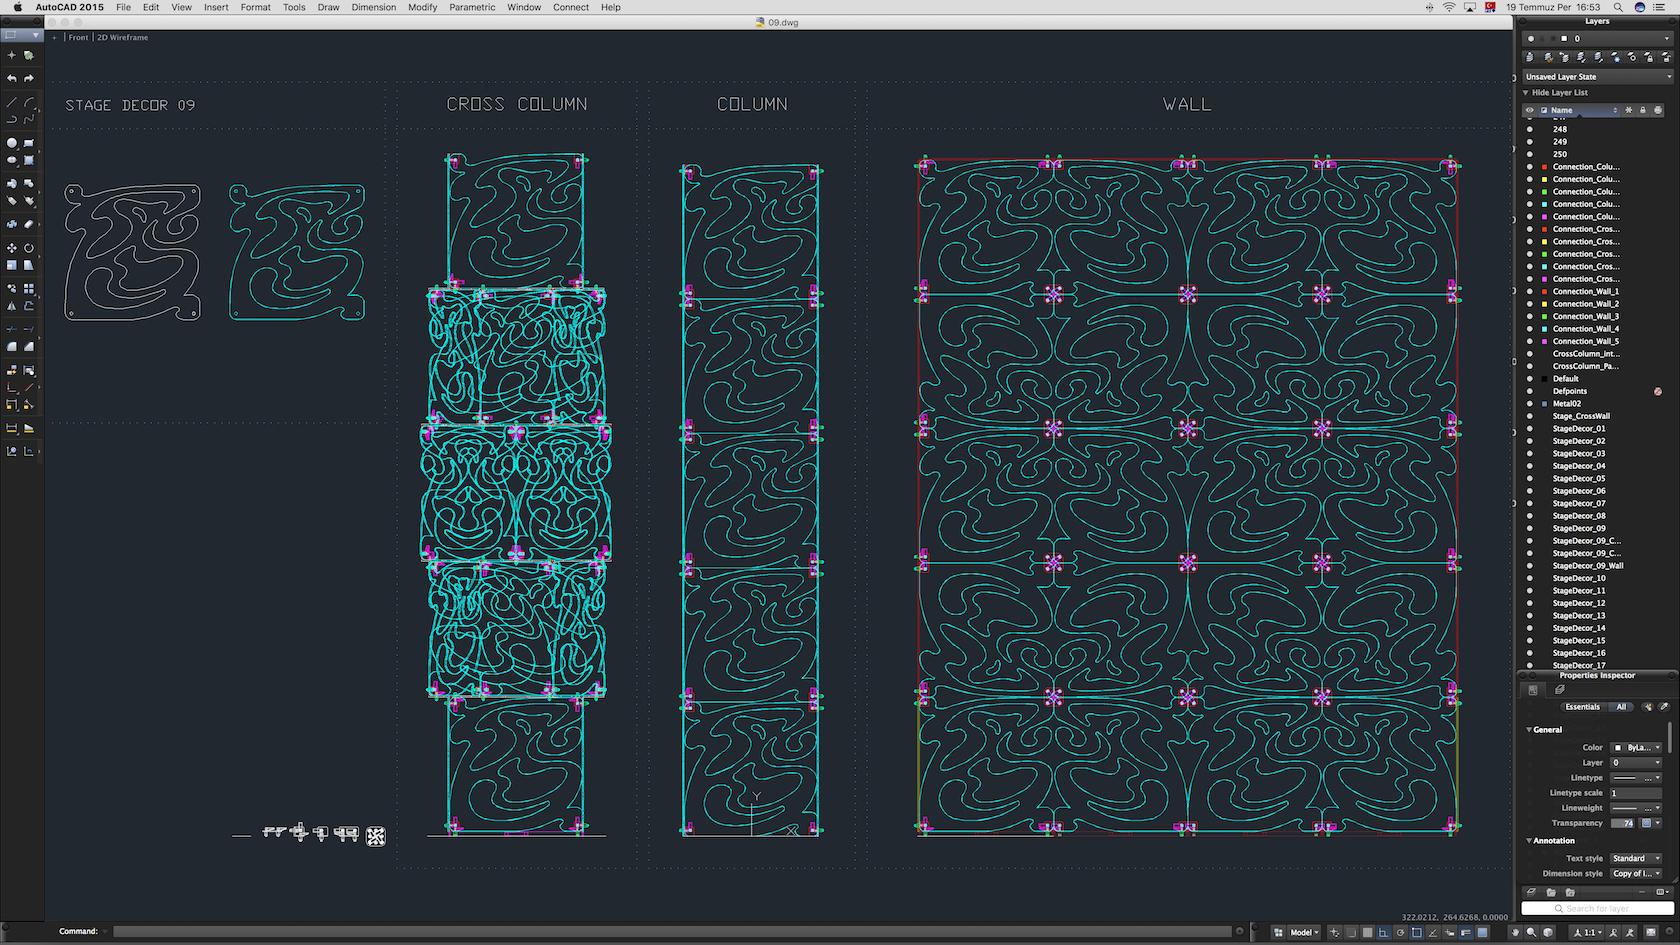 70-Cad-09-01-1680.jpg Download STL file Stage Decor Collection 01 (Modular 9 Pieces) • 3D printer model, akerStudio